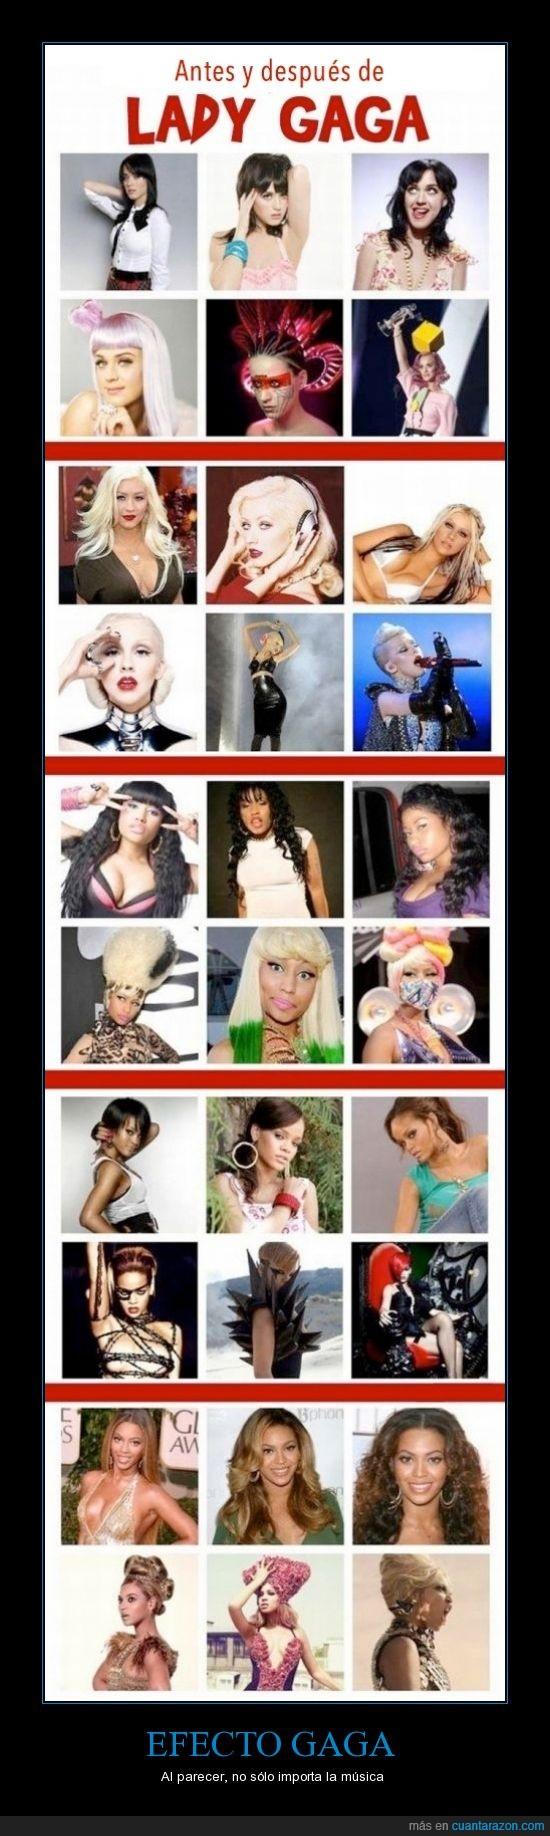 Beyoncé,Christina Aguilera,Katy Perry,Lady Gaga,Nicki Minaj,Rihanna